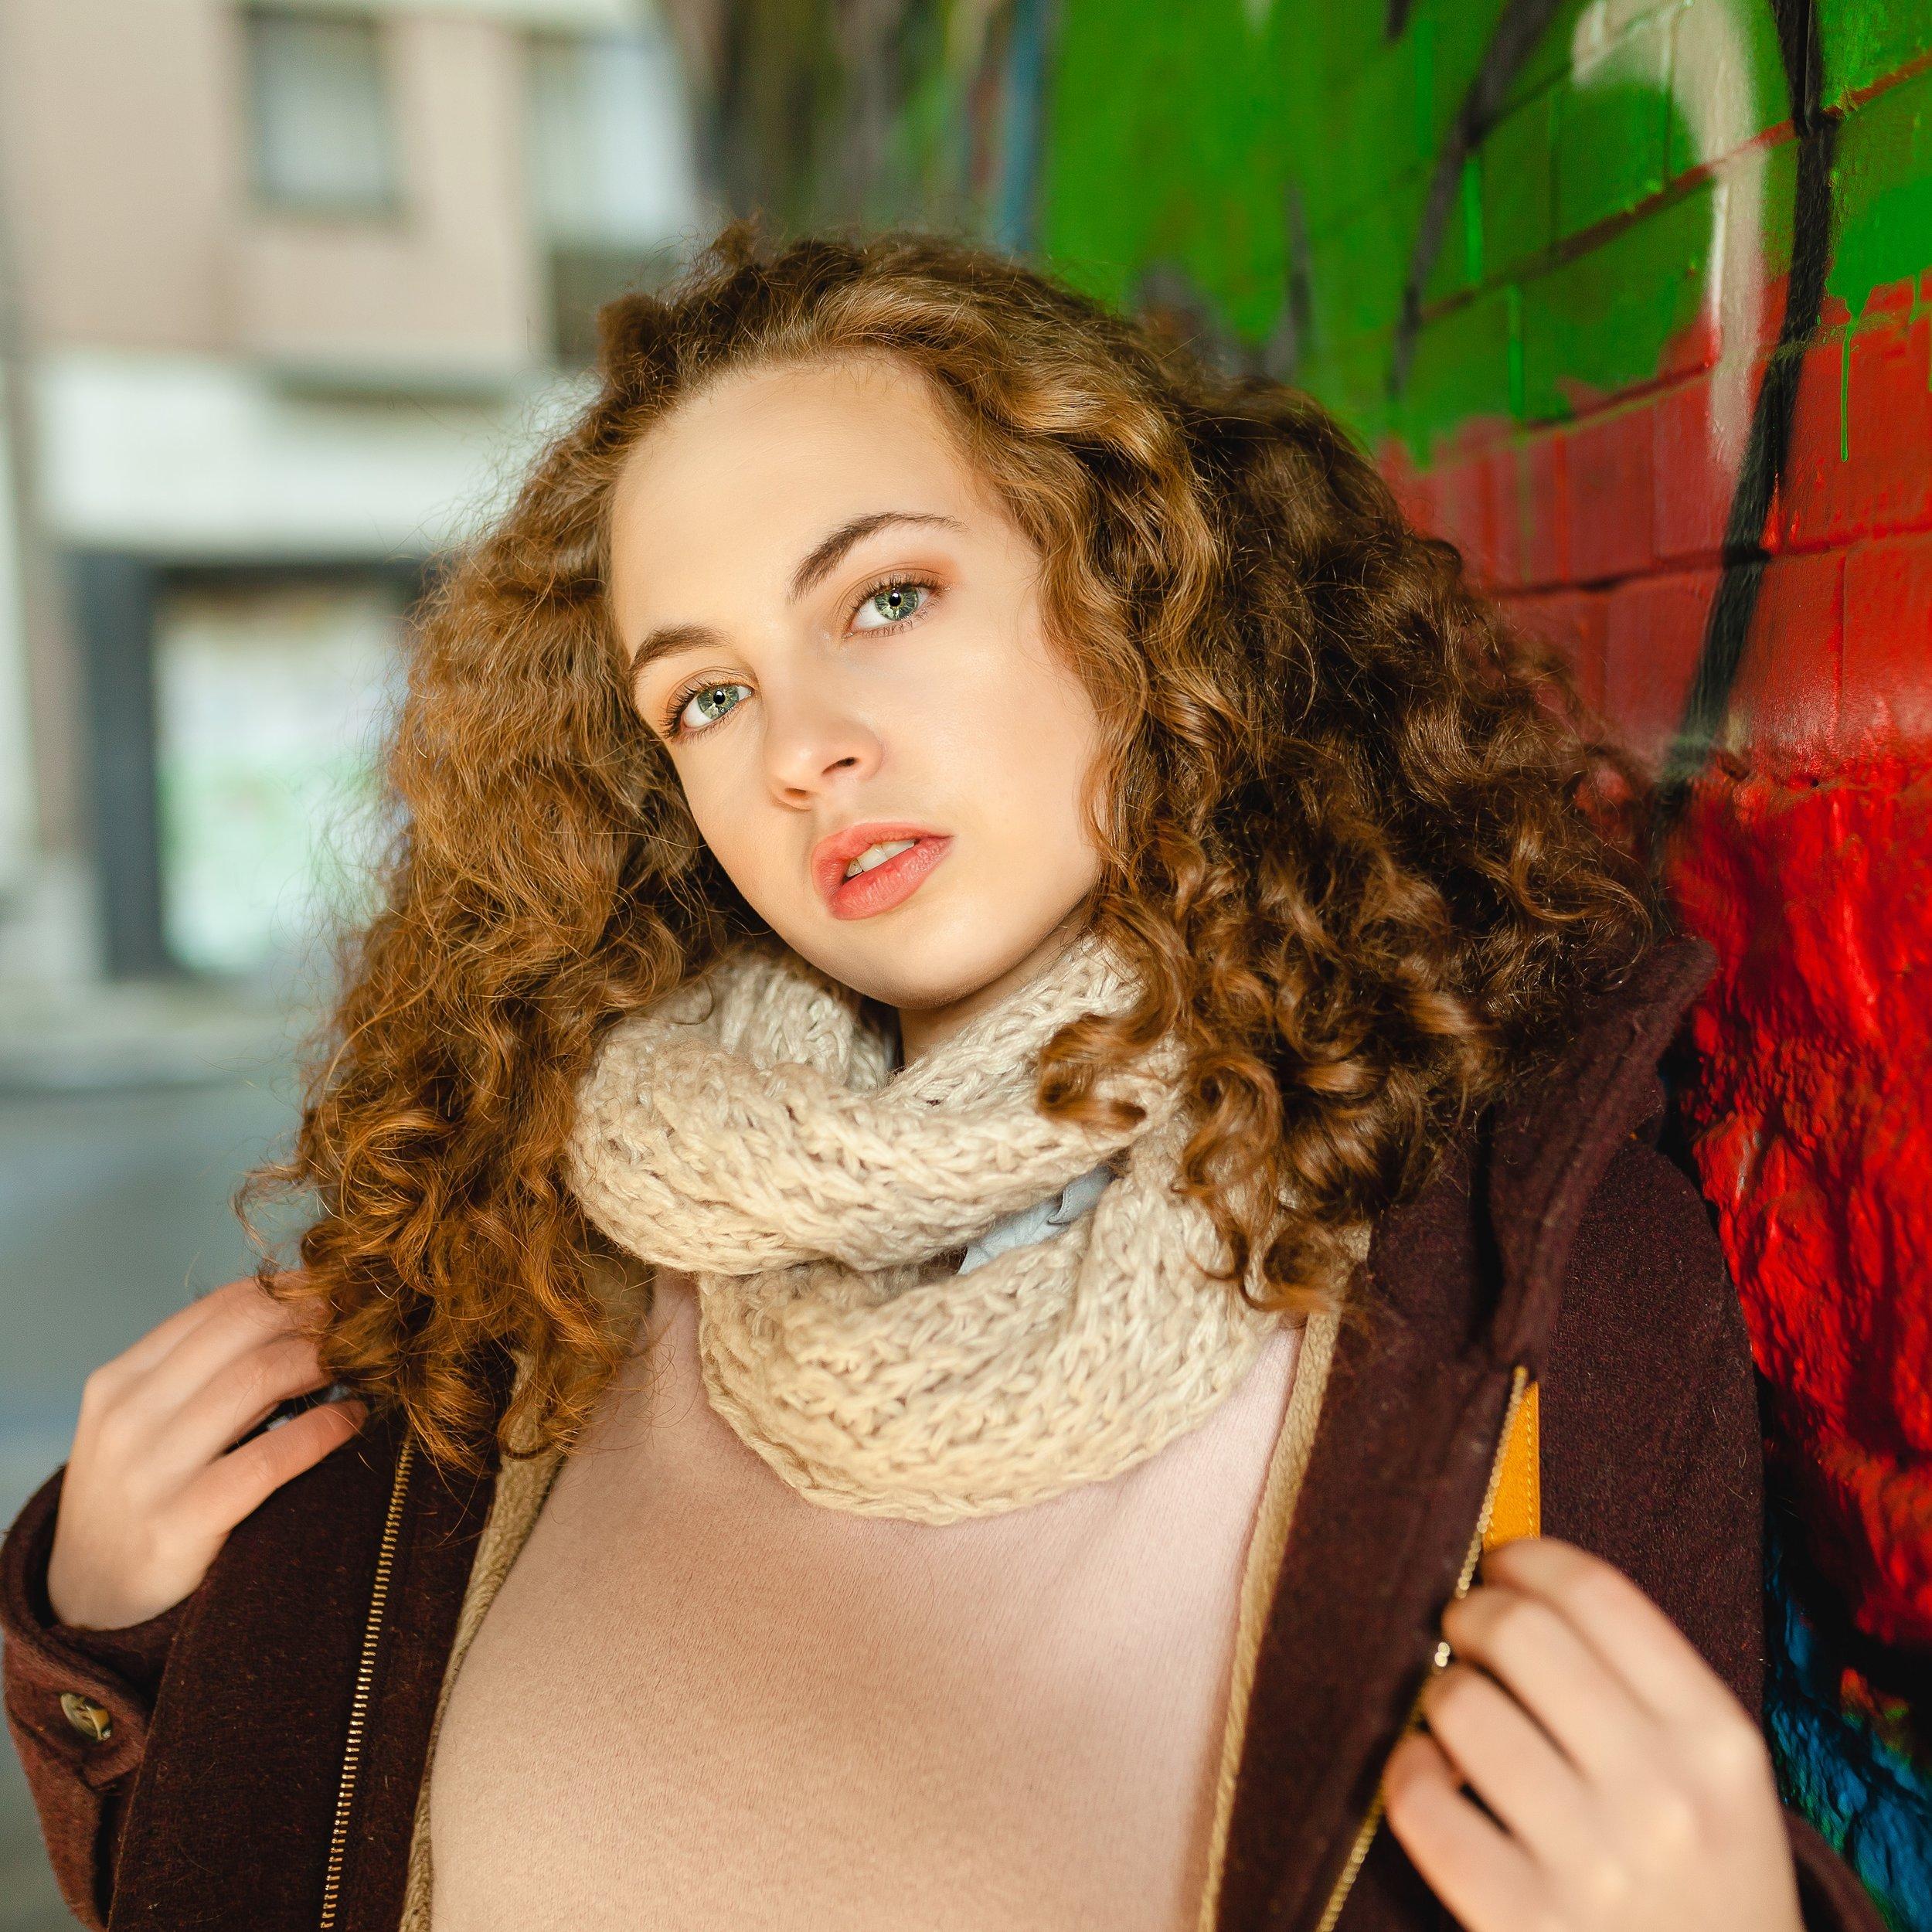 Featured Fashion Model_Elsa Letist_East-Flanders, Belgium_Model Citizen Blog-4.jpg